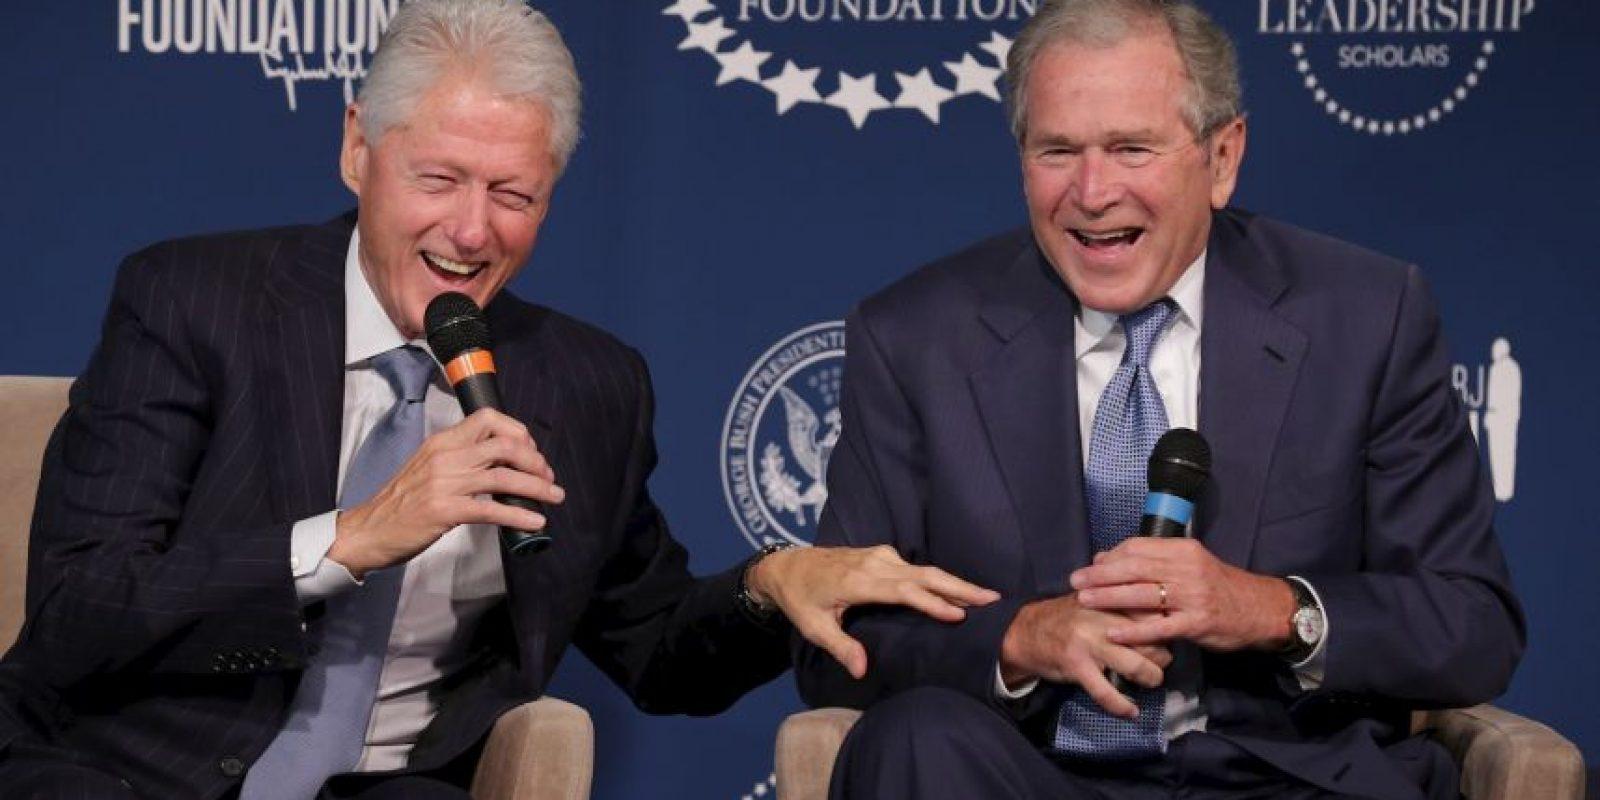 7. Bill Clinton Foto:Getty Images